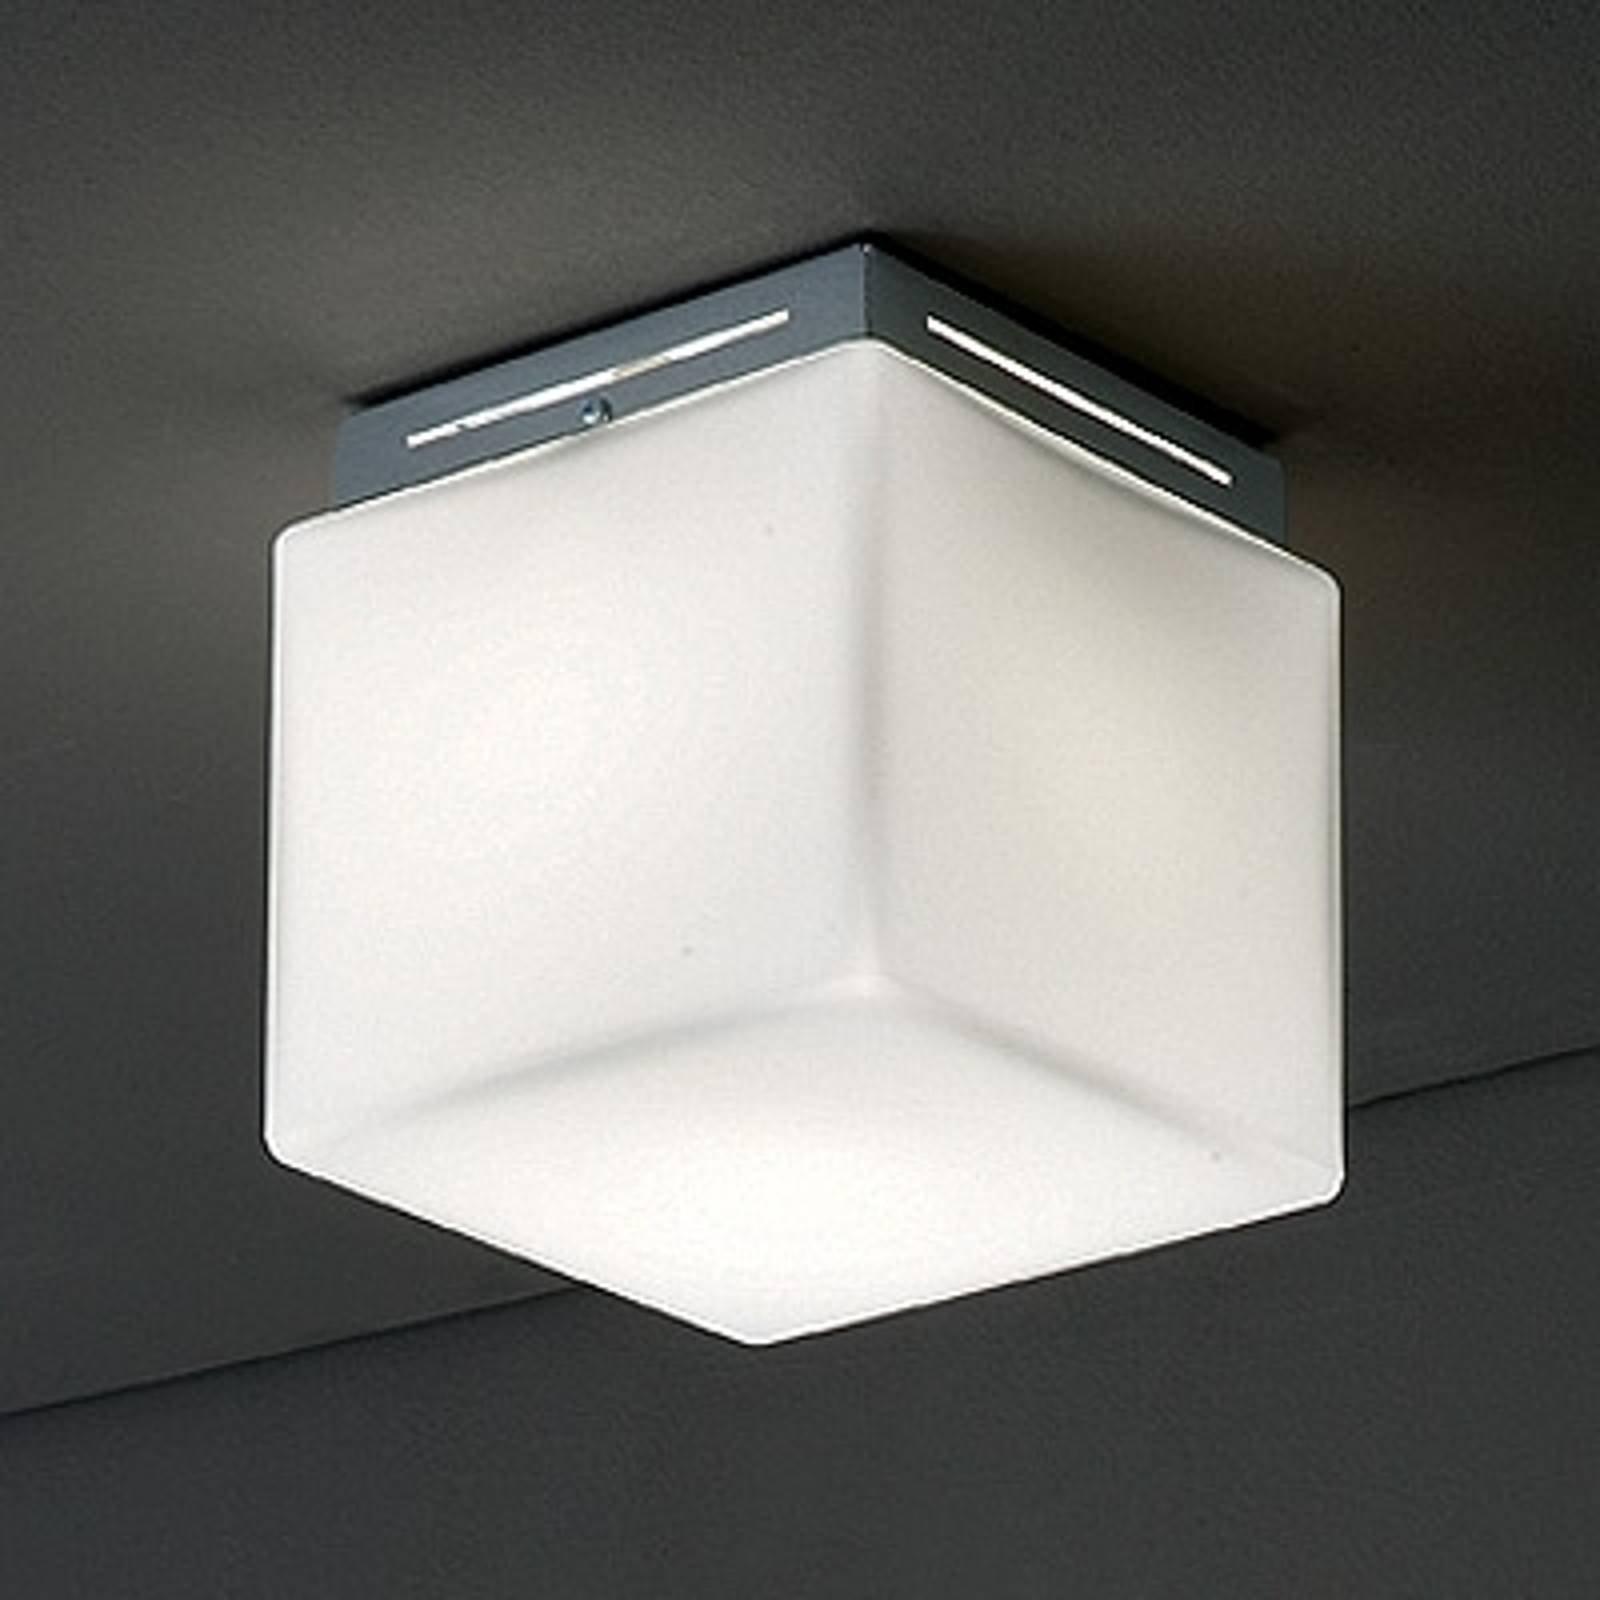 Cubis taklampe i krom